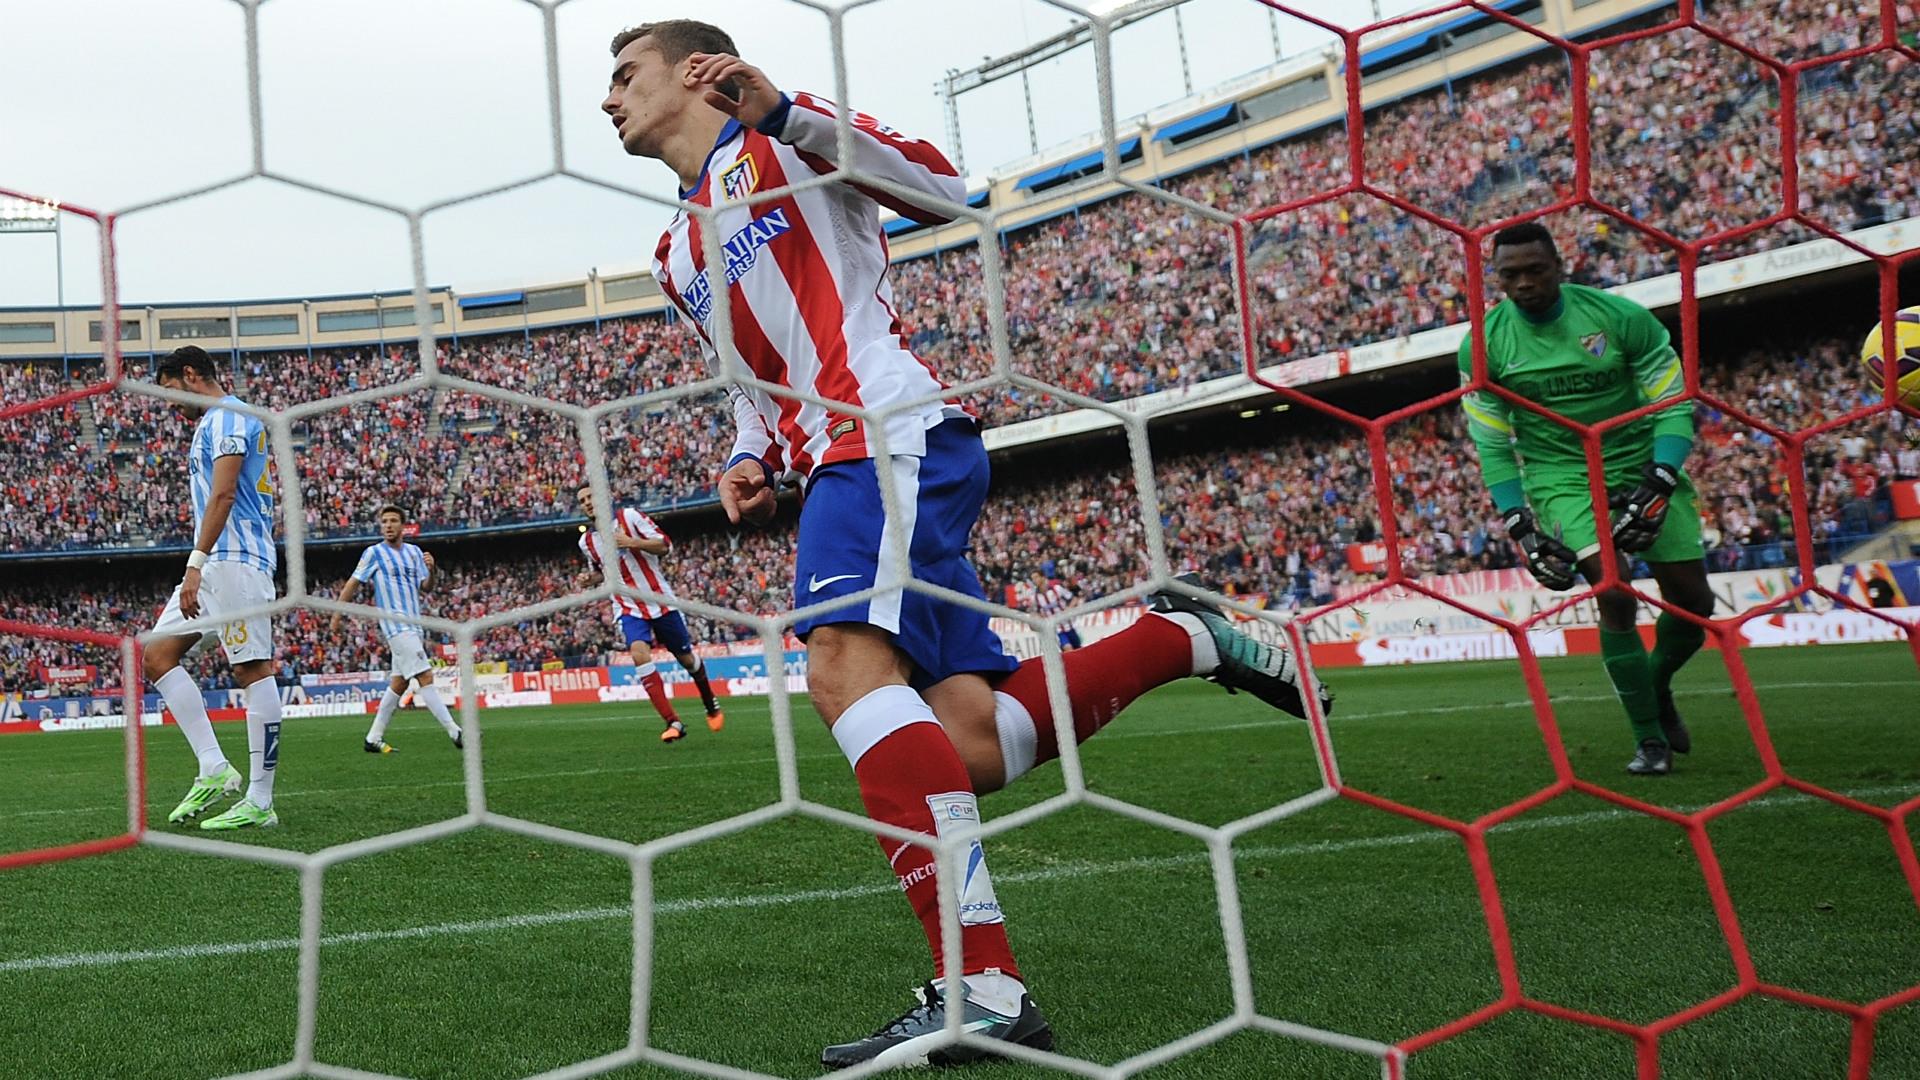 Antoine Griezmann Carlos Kameni Atletico Madrid Malaga Liga BBVA 11222014